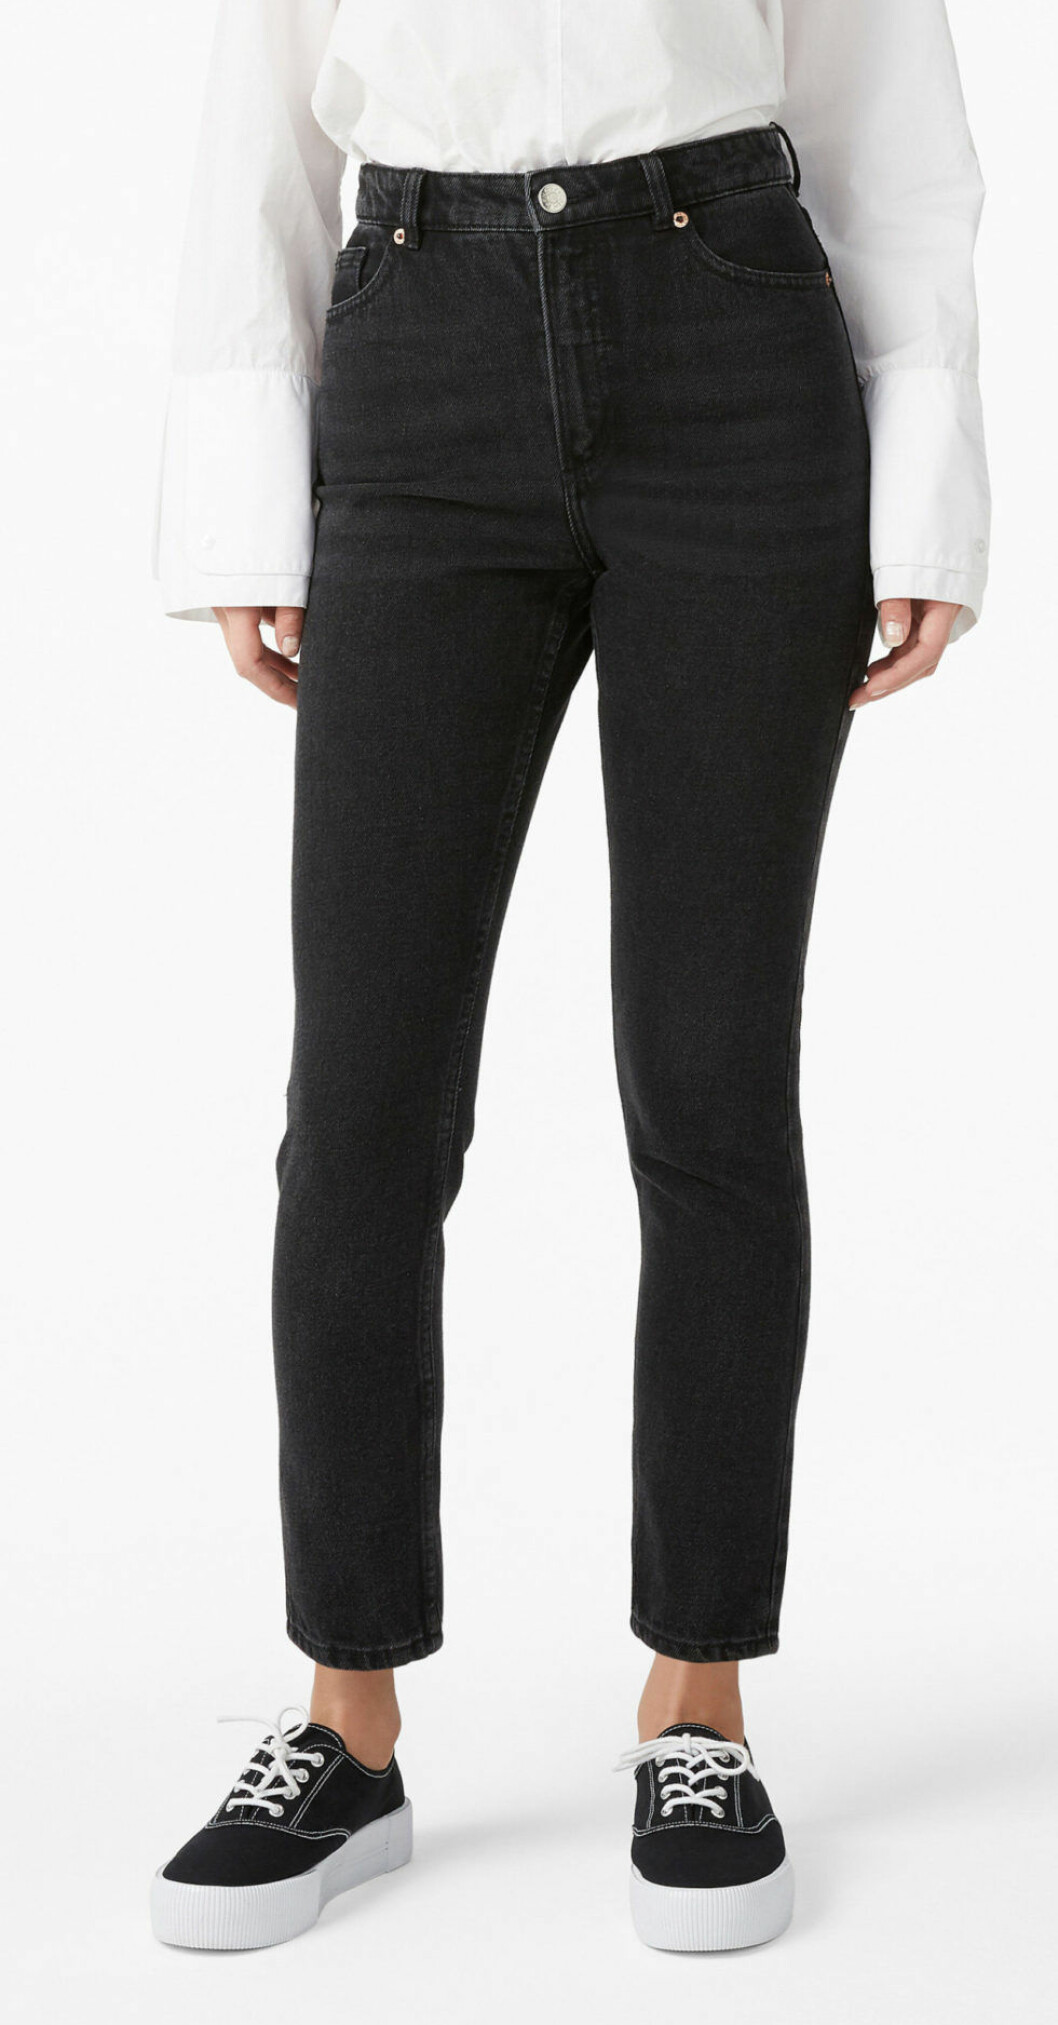 jeans-hosten-2018-monki